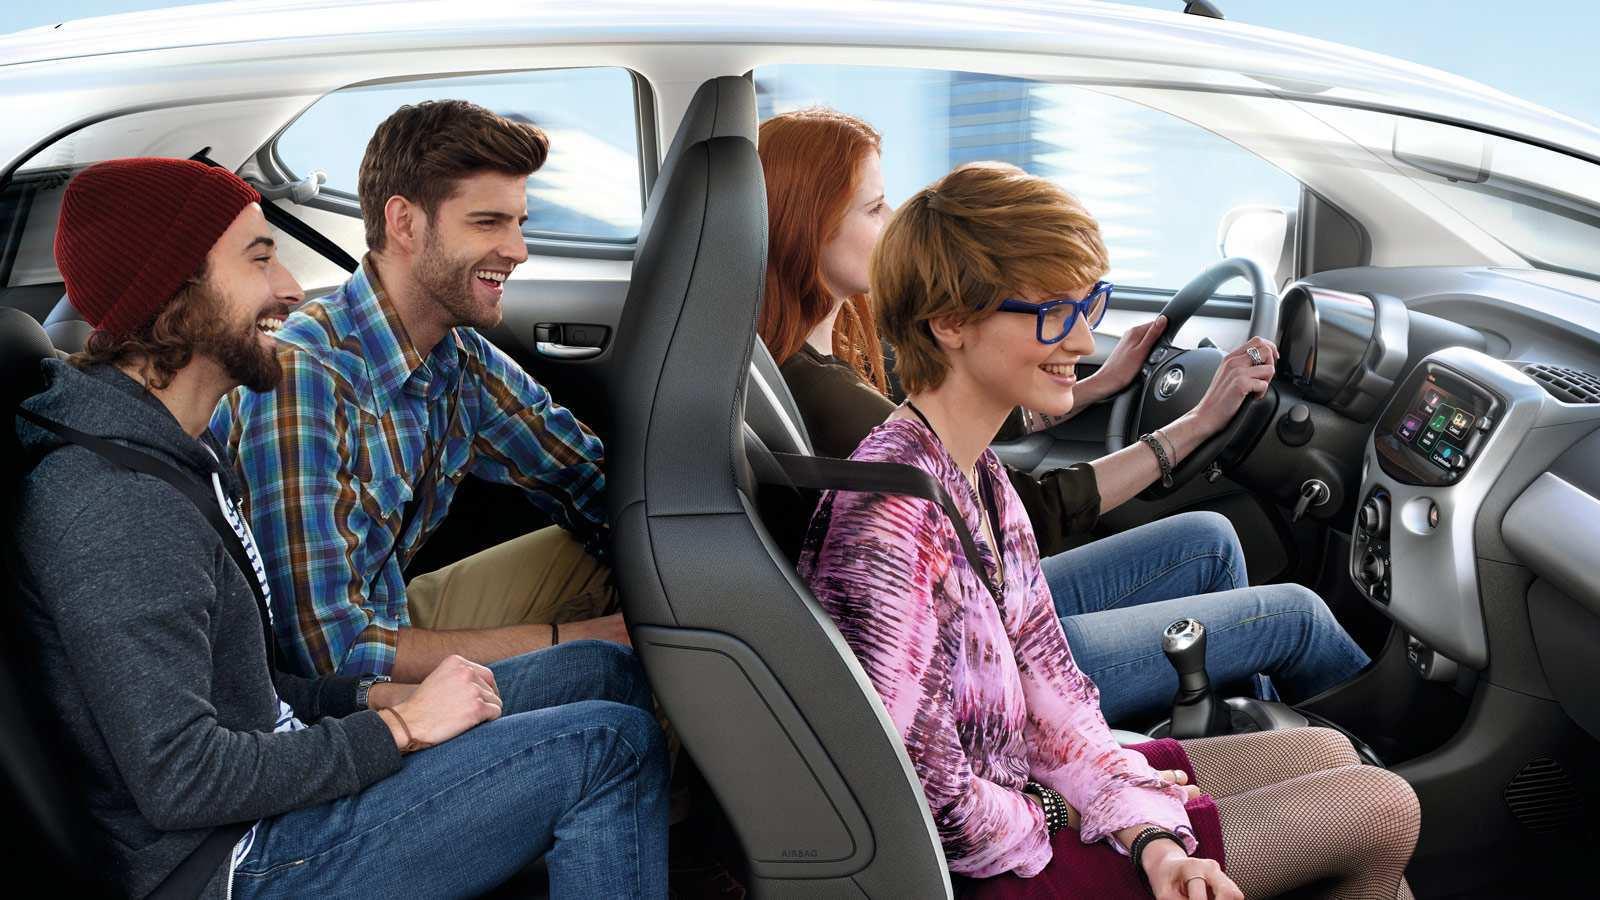 17 Great Toyota Internship 2019 Picture for Toyota Internship 2019